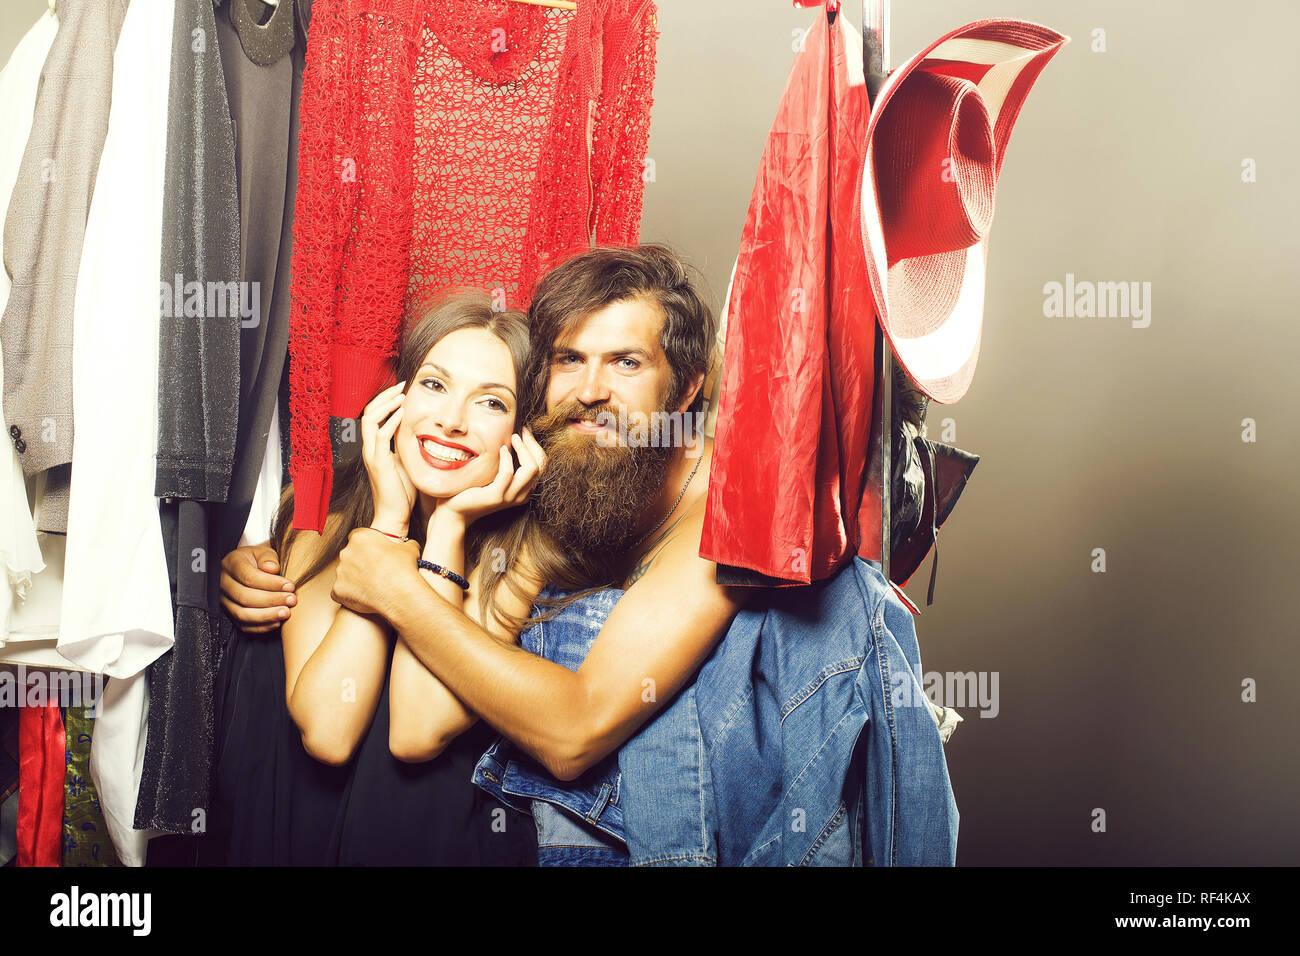 Fashion couple in closet - Stock Image